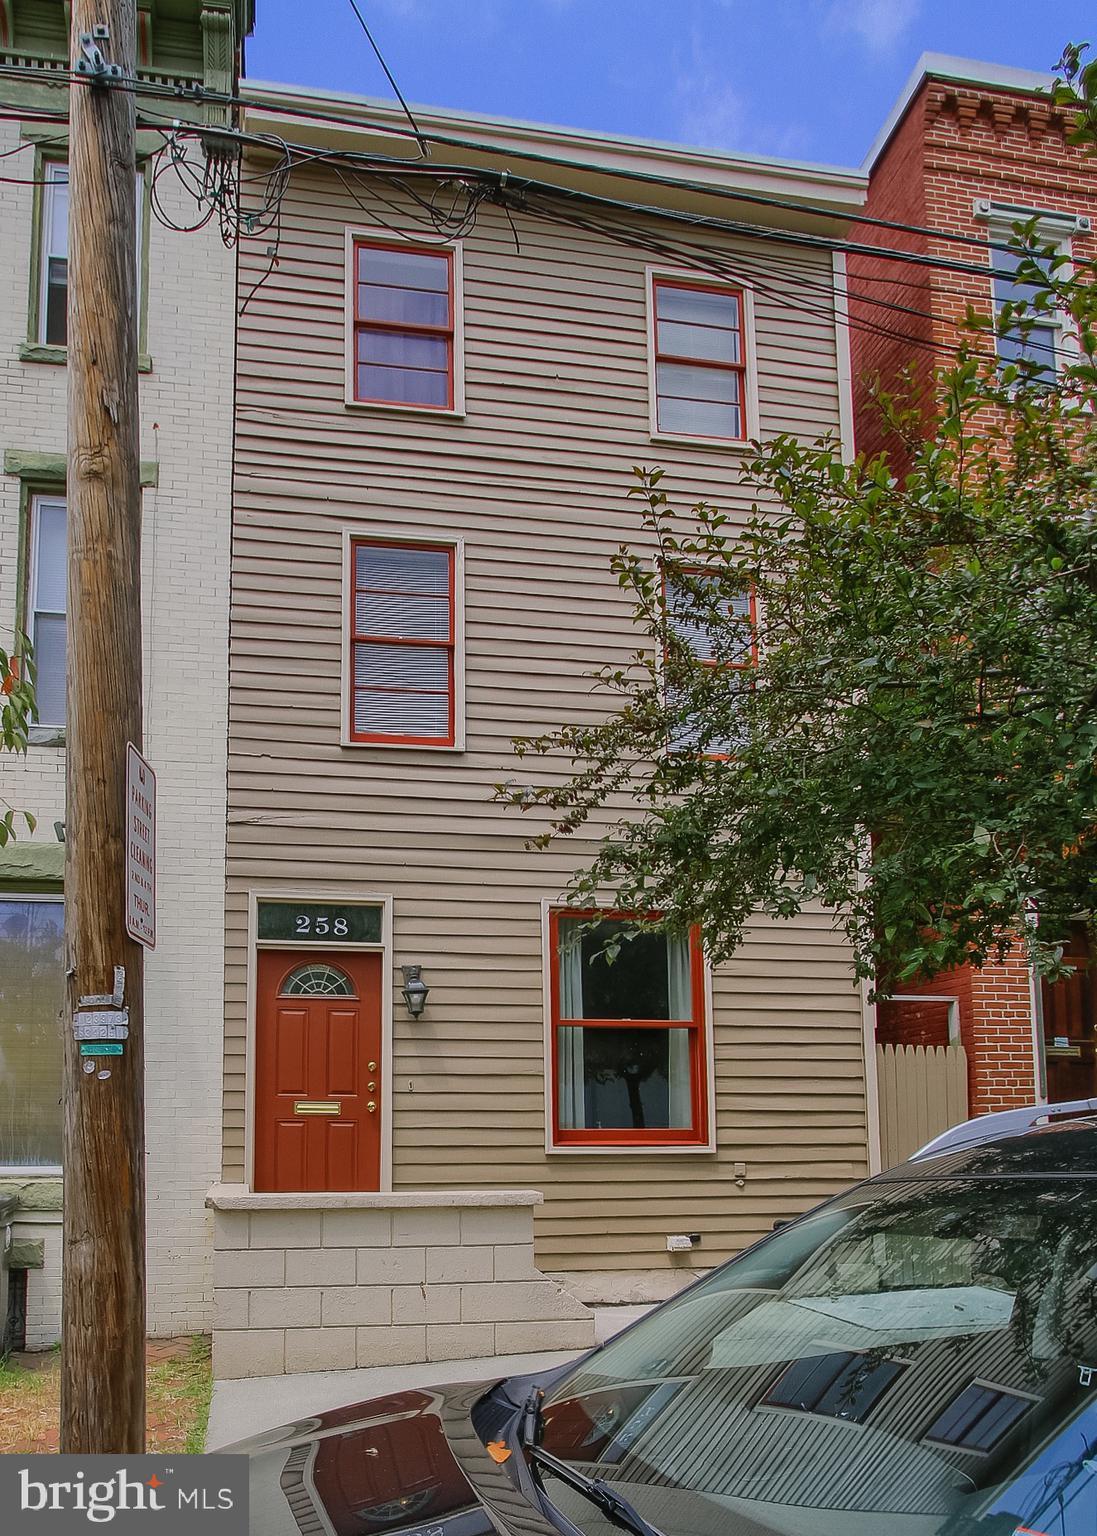 258 CALDER STREET, HARRISBURG, PA 17102